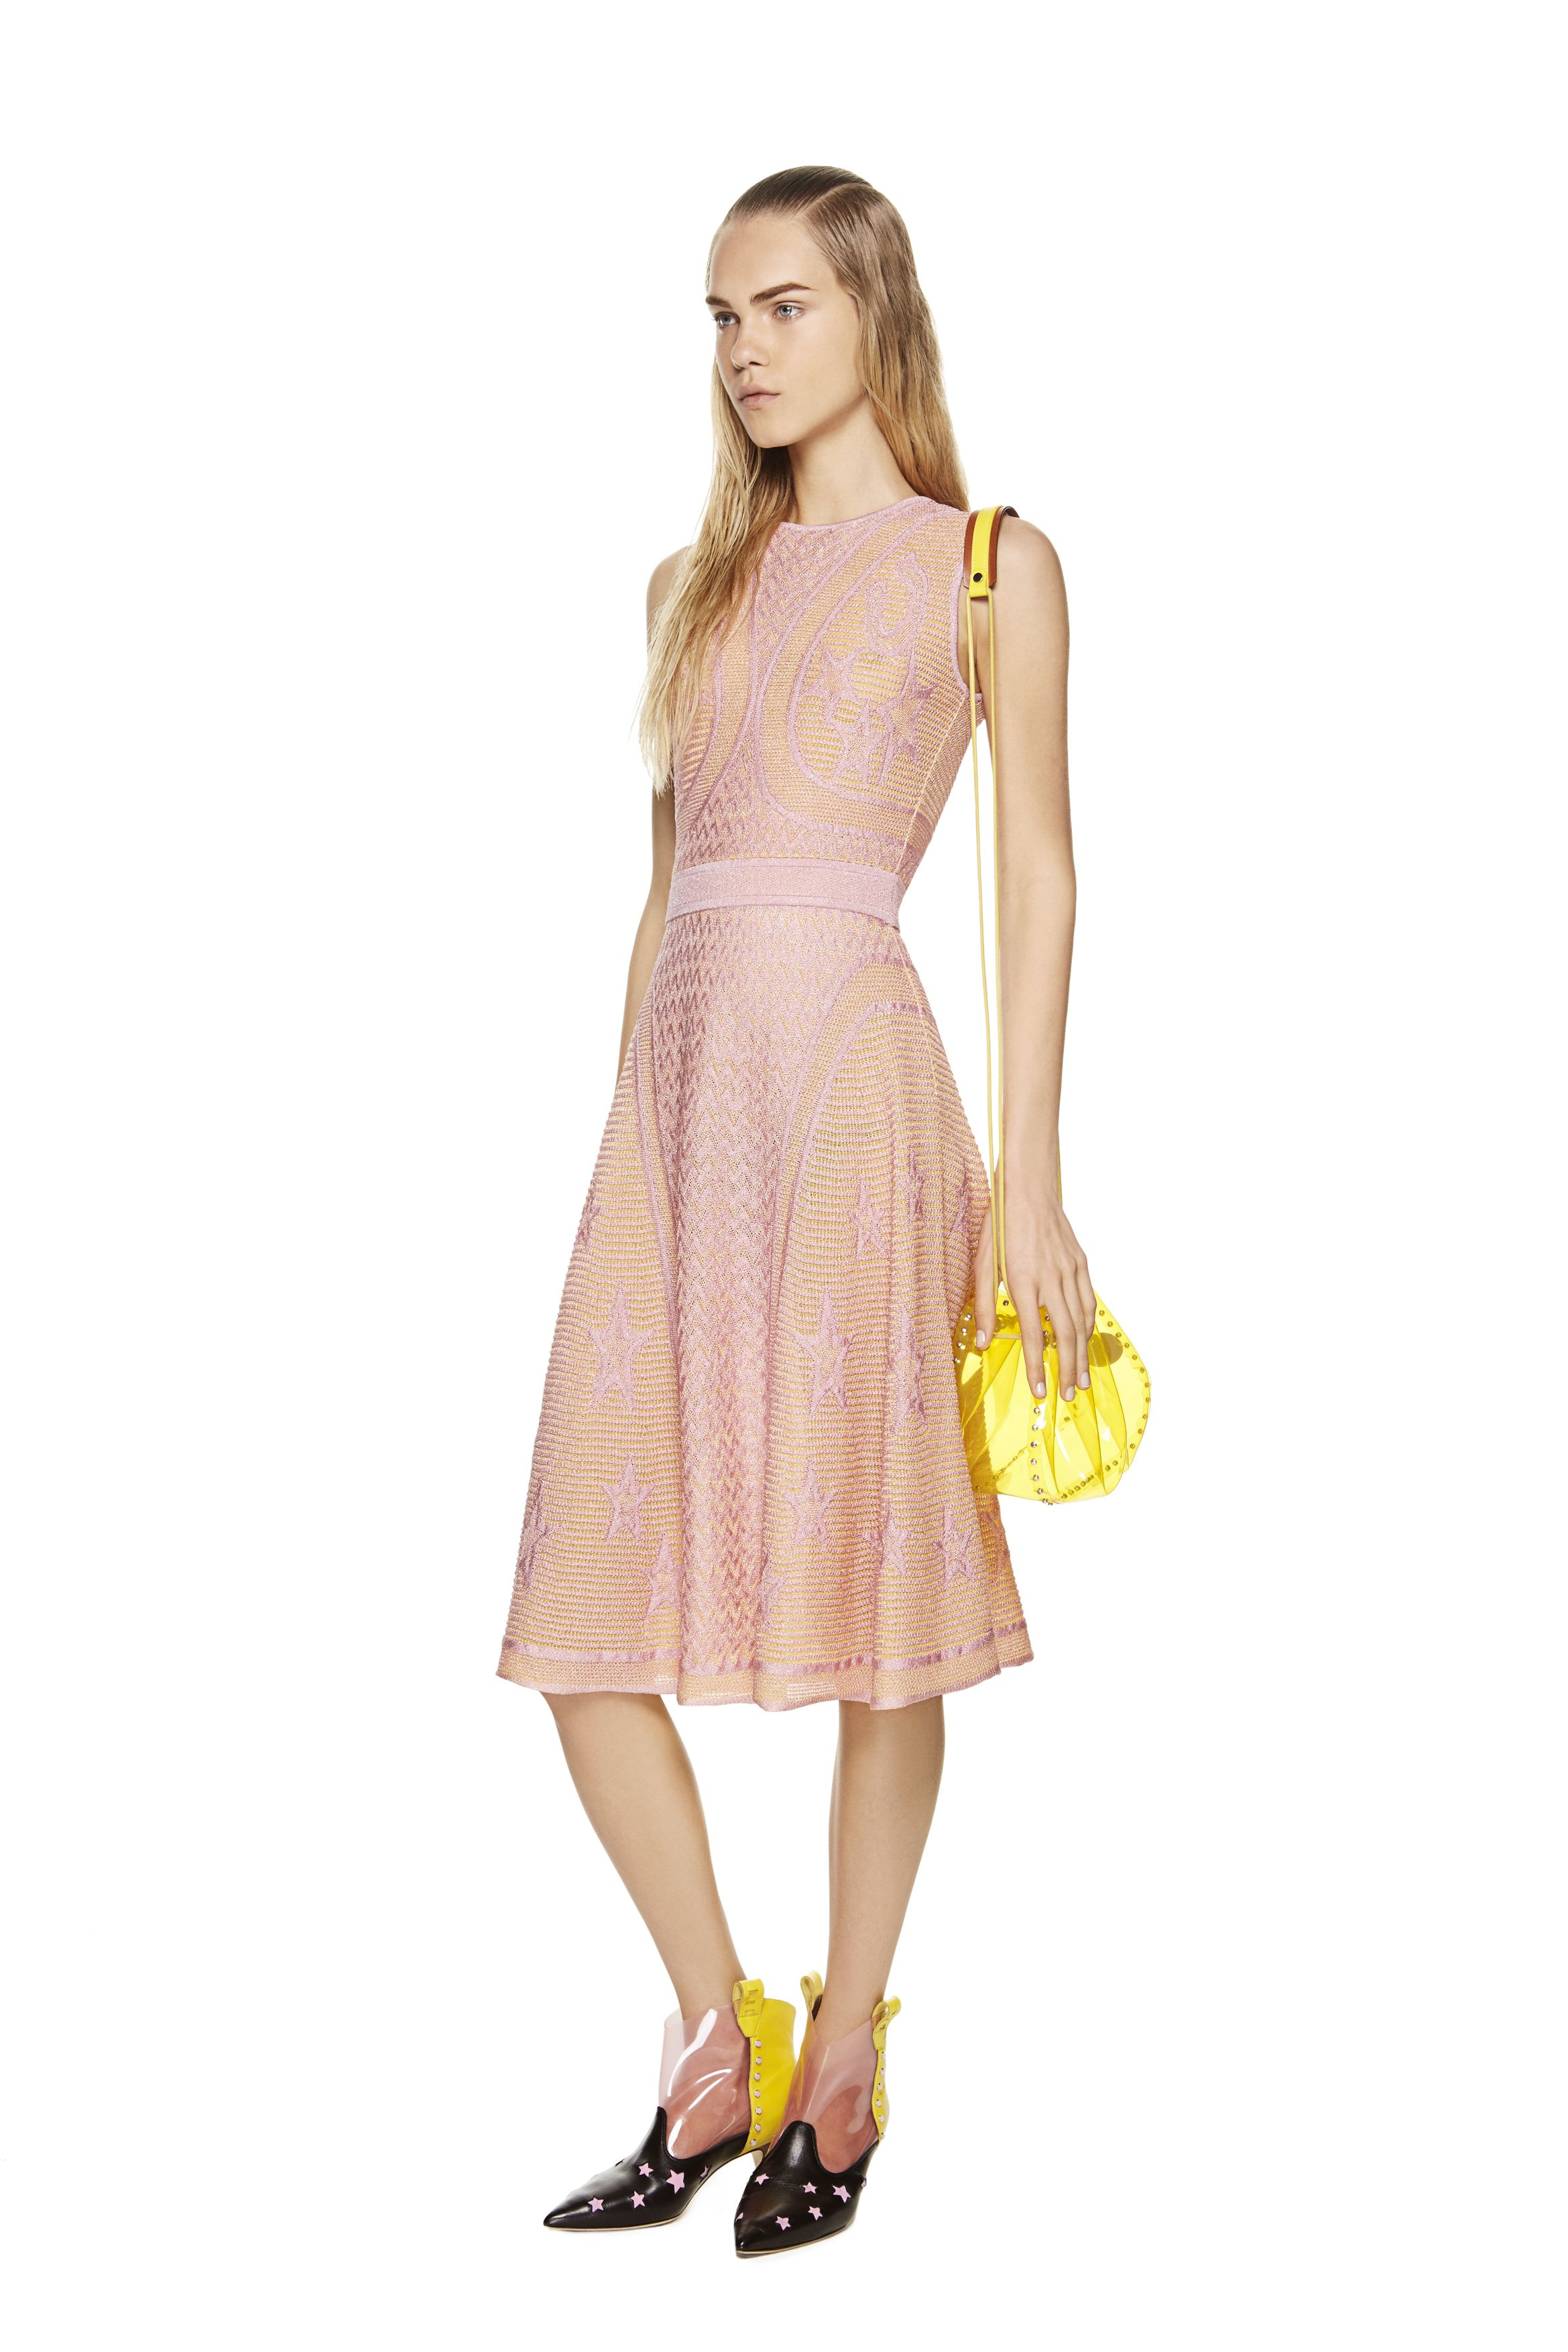 huge selection of 09468 7f46b M-Missoni - ABITO ROSA IN LUREX | My wardrobe : knitwear ...